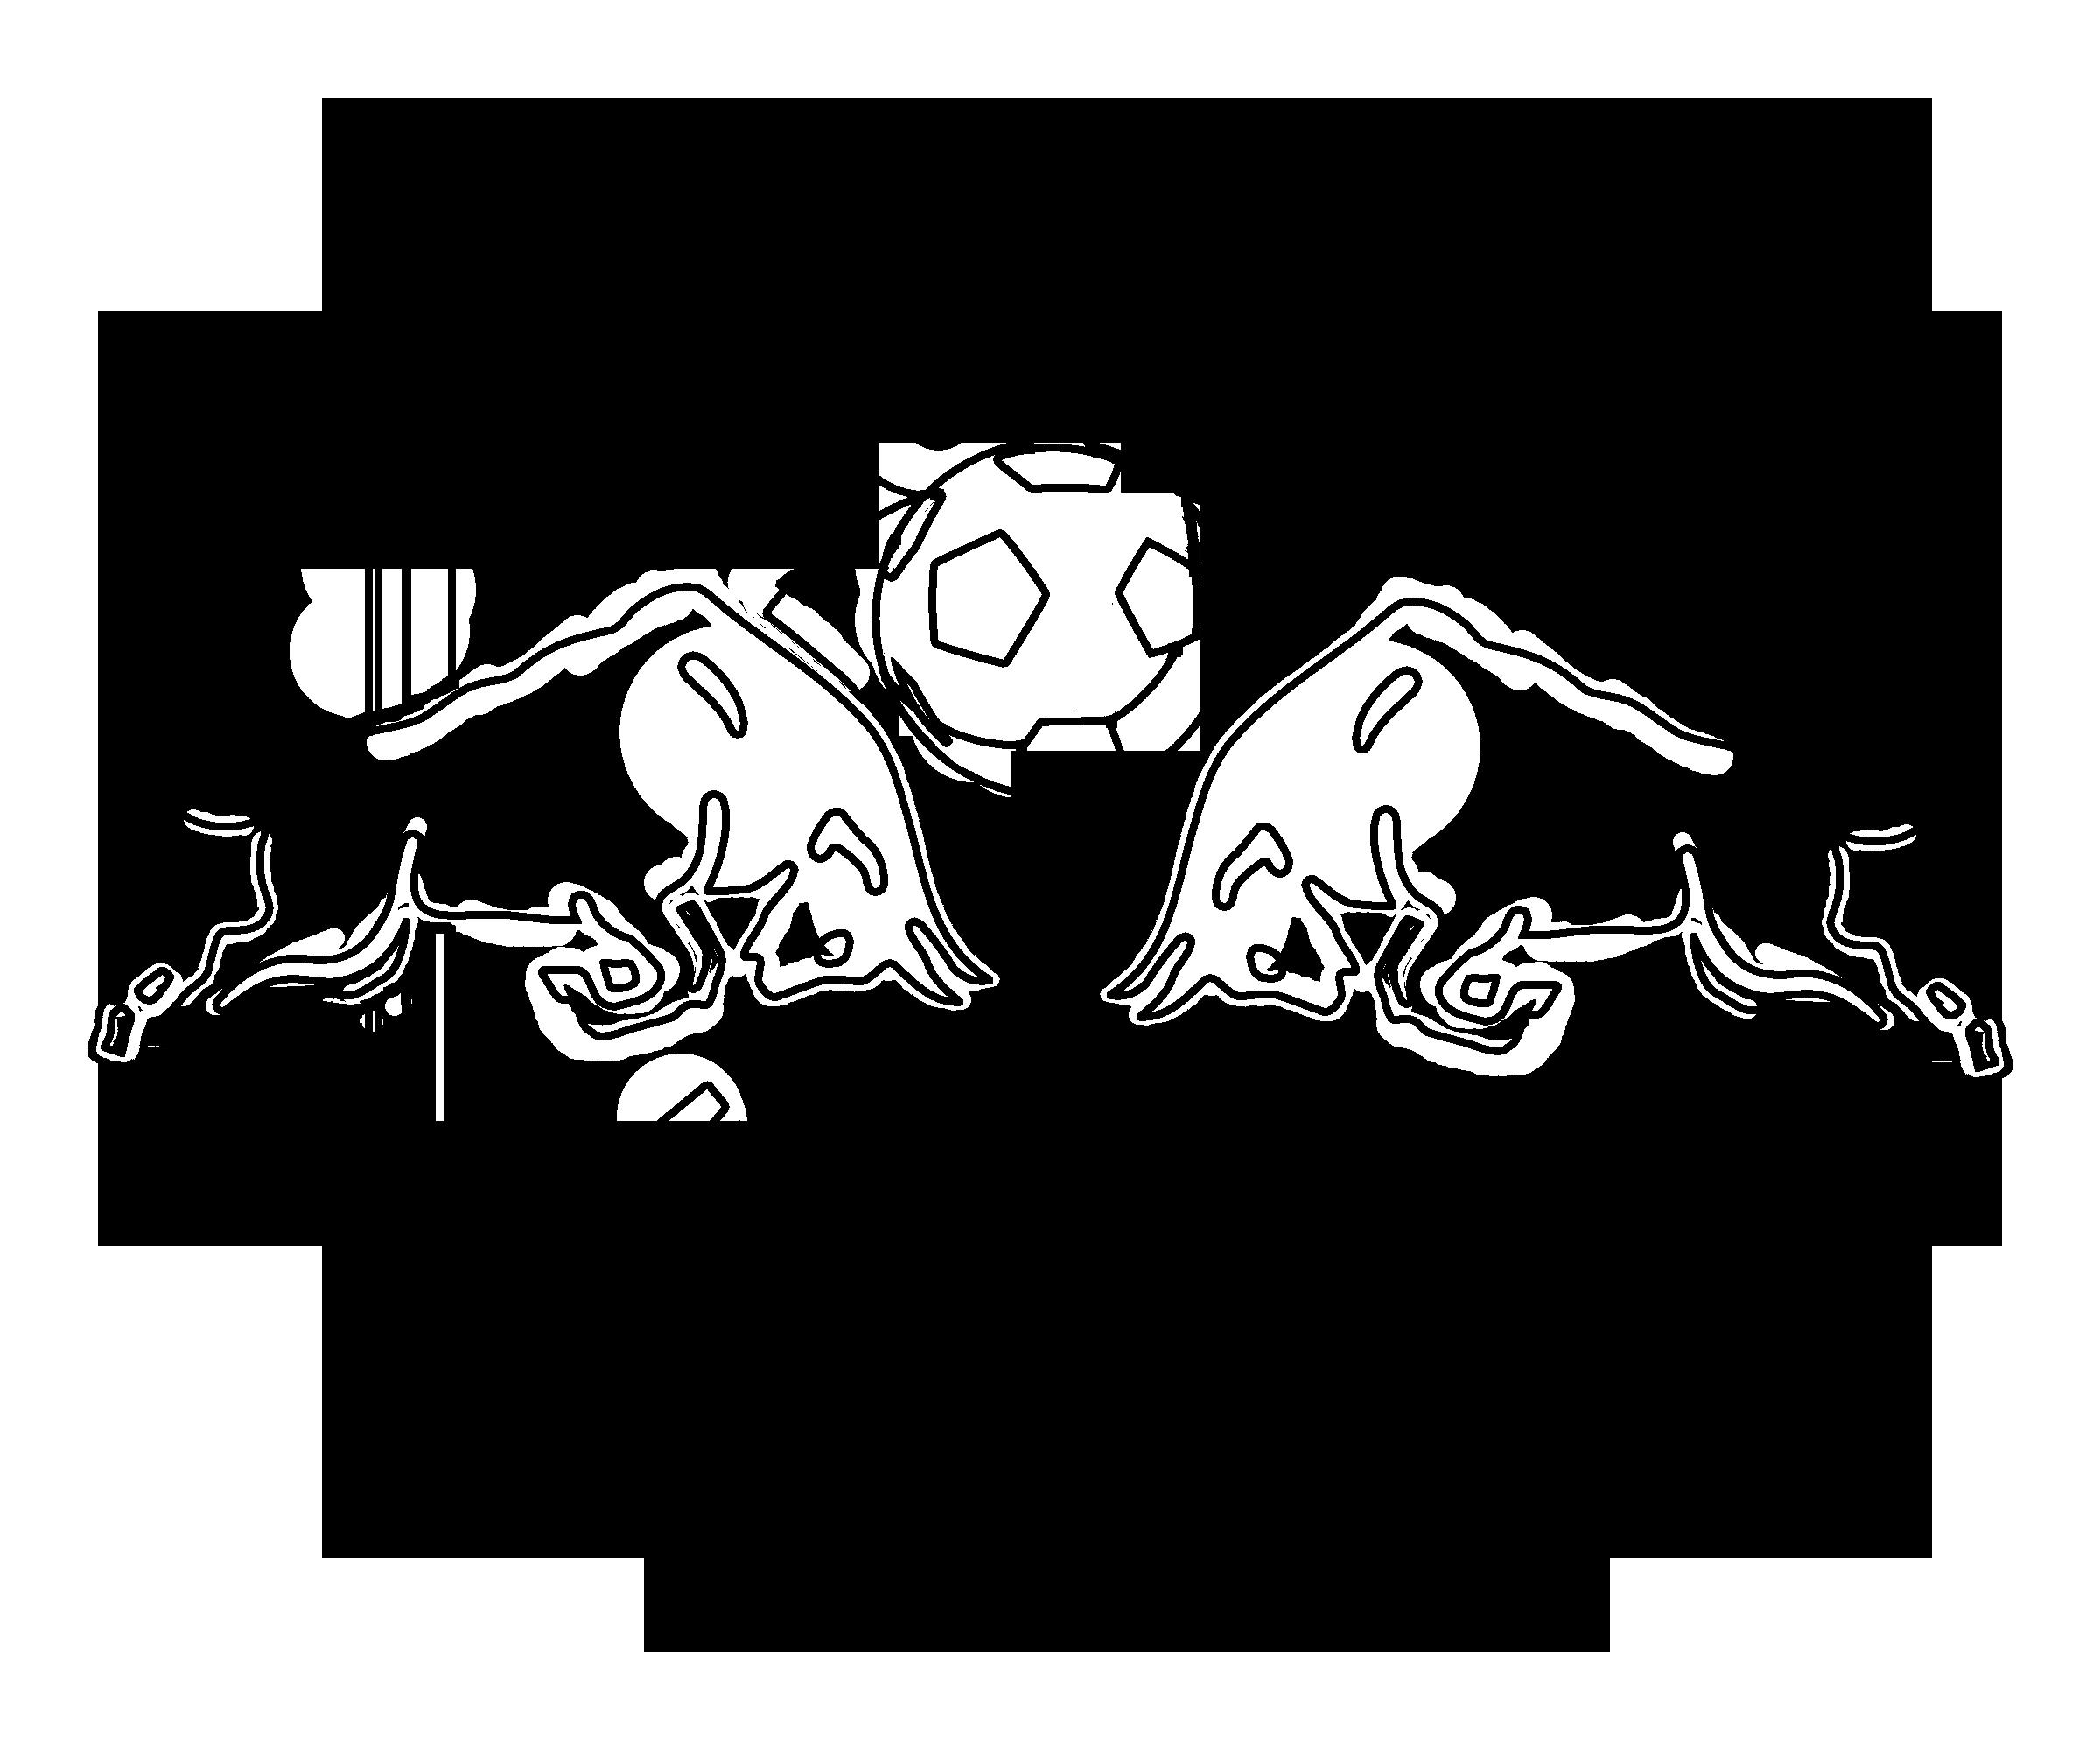 svg free download Bulls Logo Drawing at GetDrawings